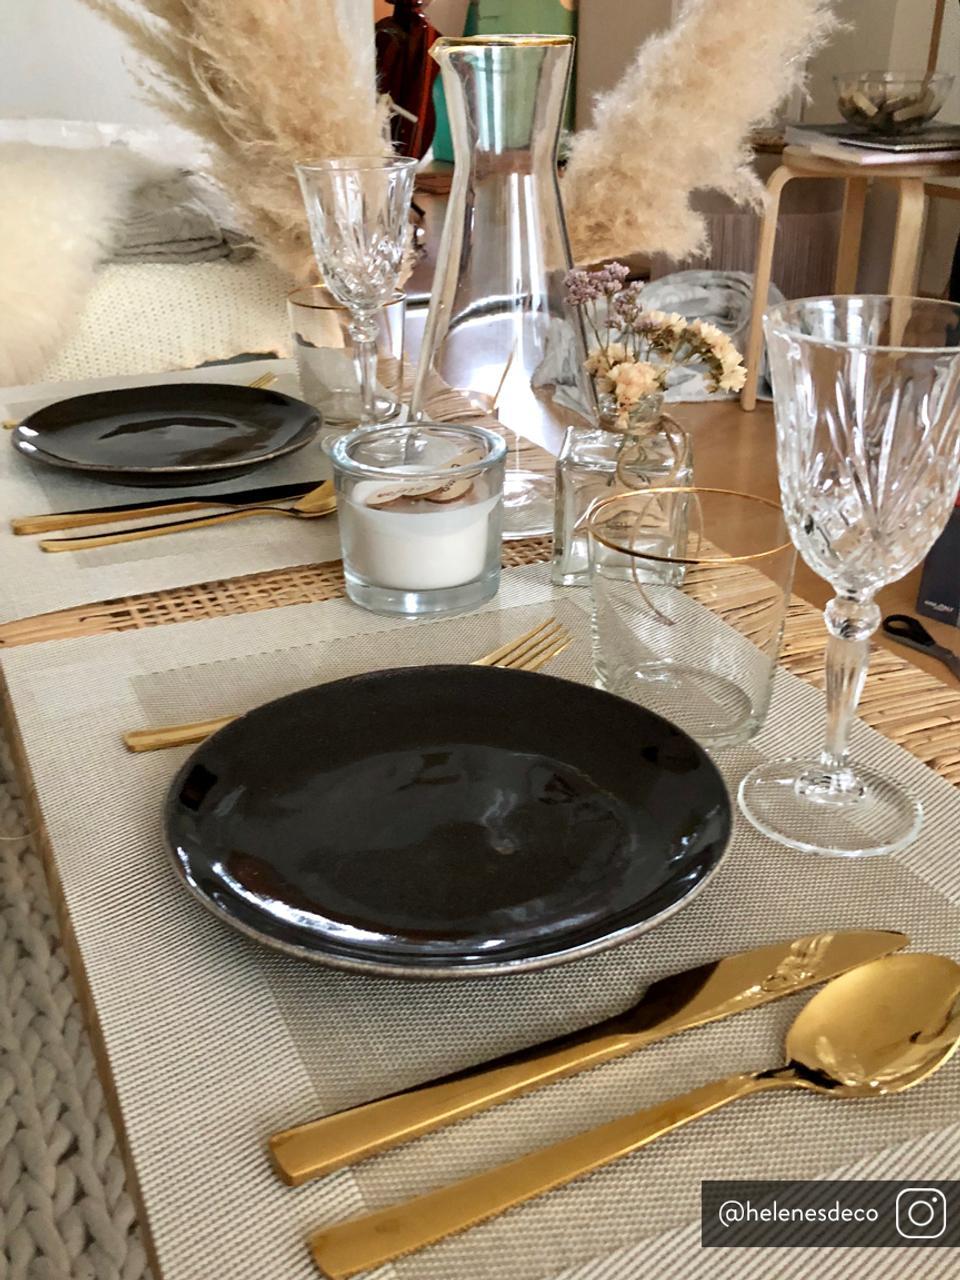 Kunststoff-Tischsets Trefl, 2 Stück, Kunststoff, Beige, Creme, 33 x 46 cm